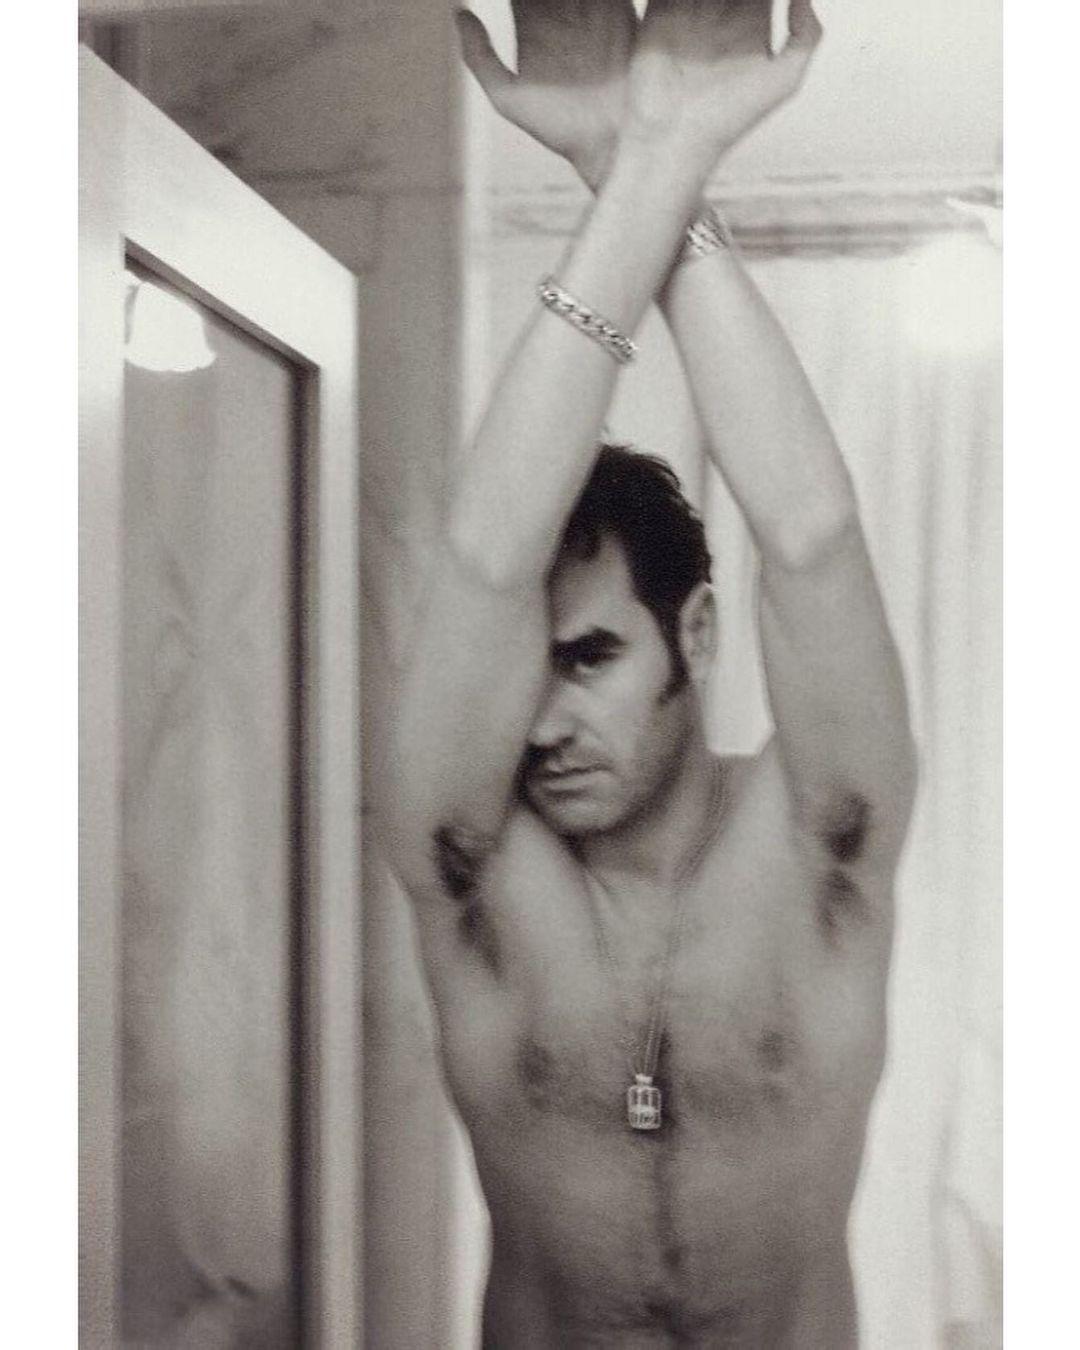 Morrissey Jake Walters 94 (i).jpg